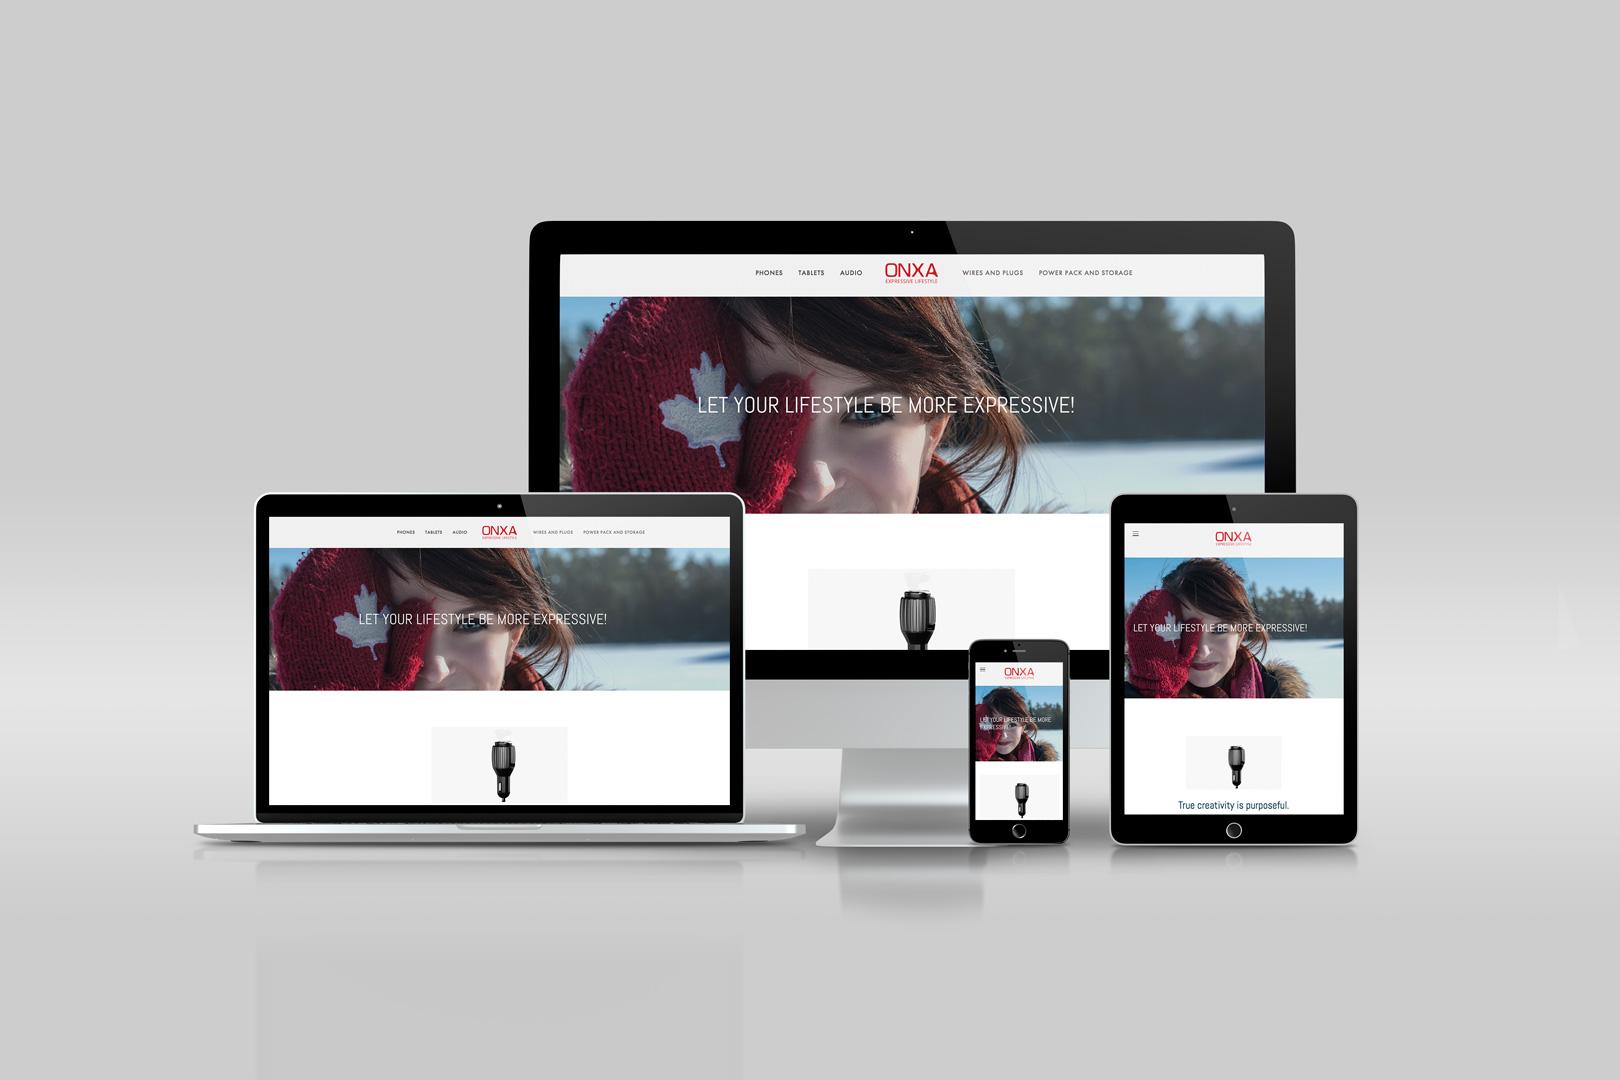 responsive shopping and ecommerce website design desktop, laptop, smartphone and tablet